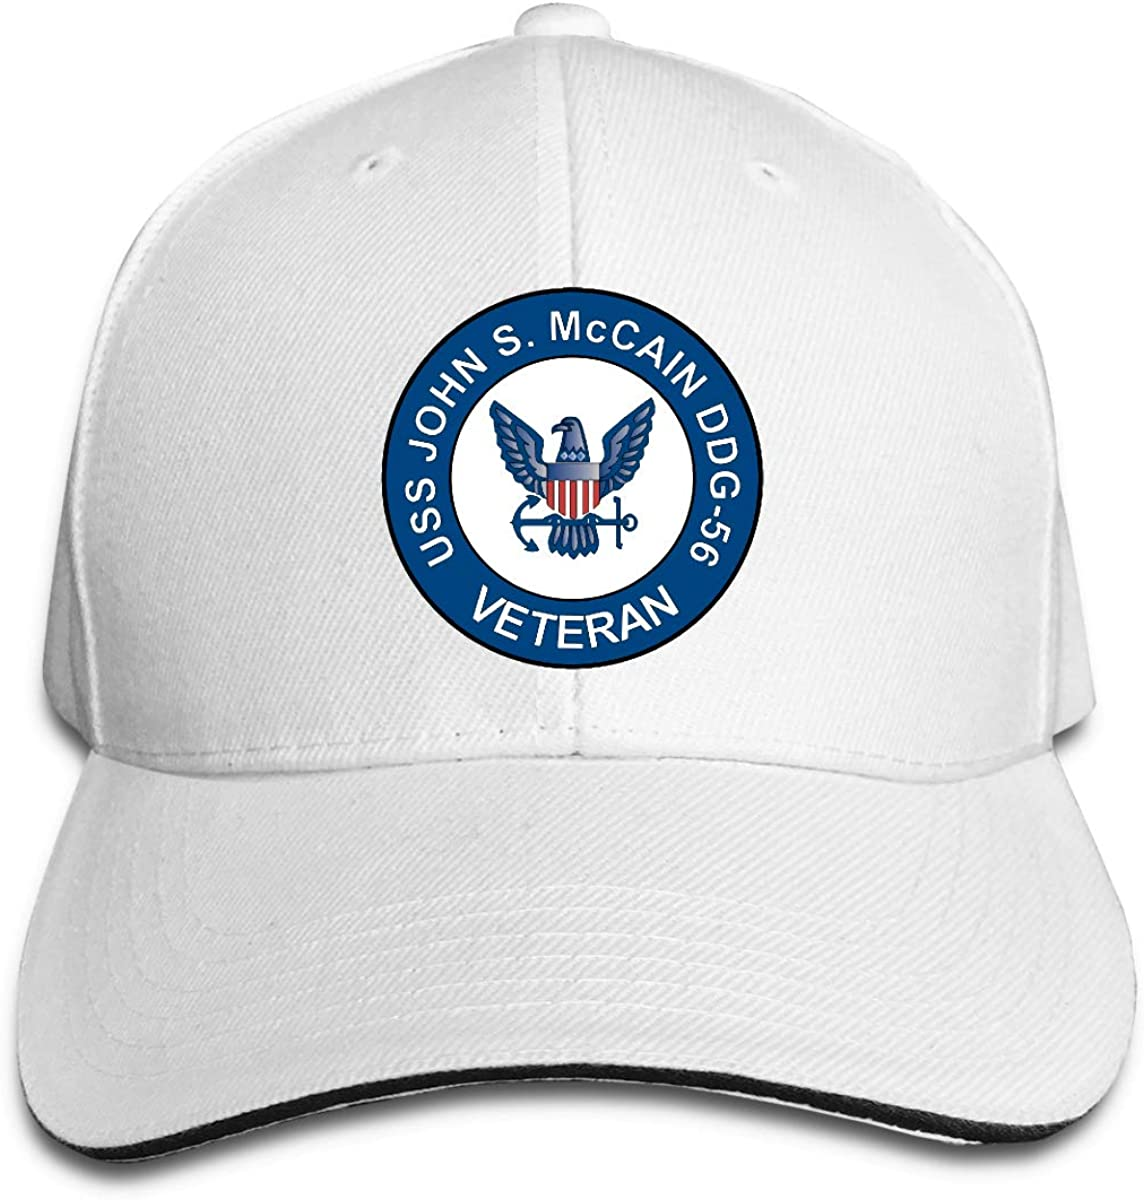 USS John S McCain DDG-56 Veteran Adjustable Baseball Caps Vintage Sandwich Hat